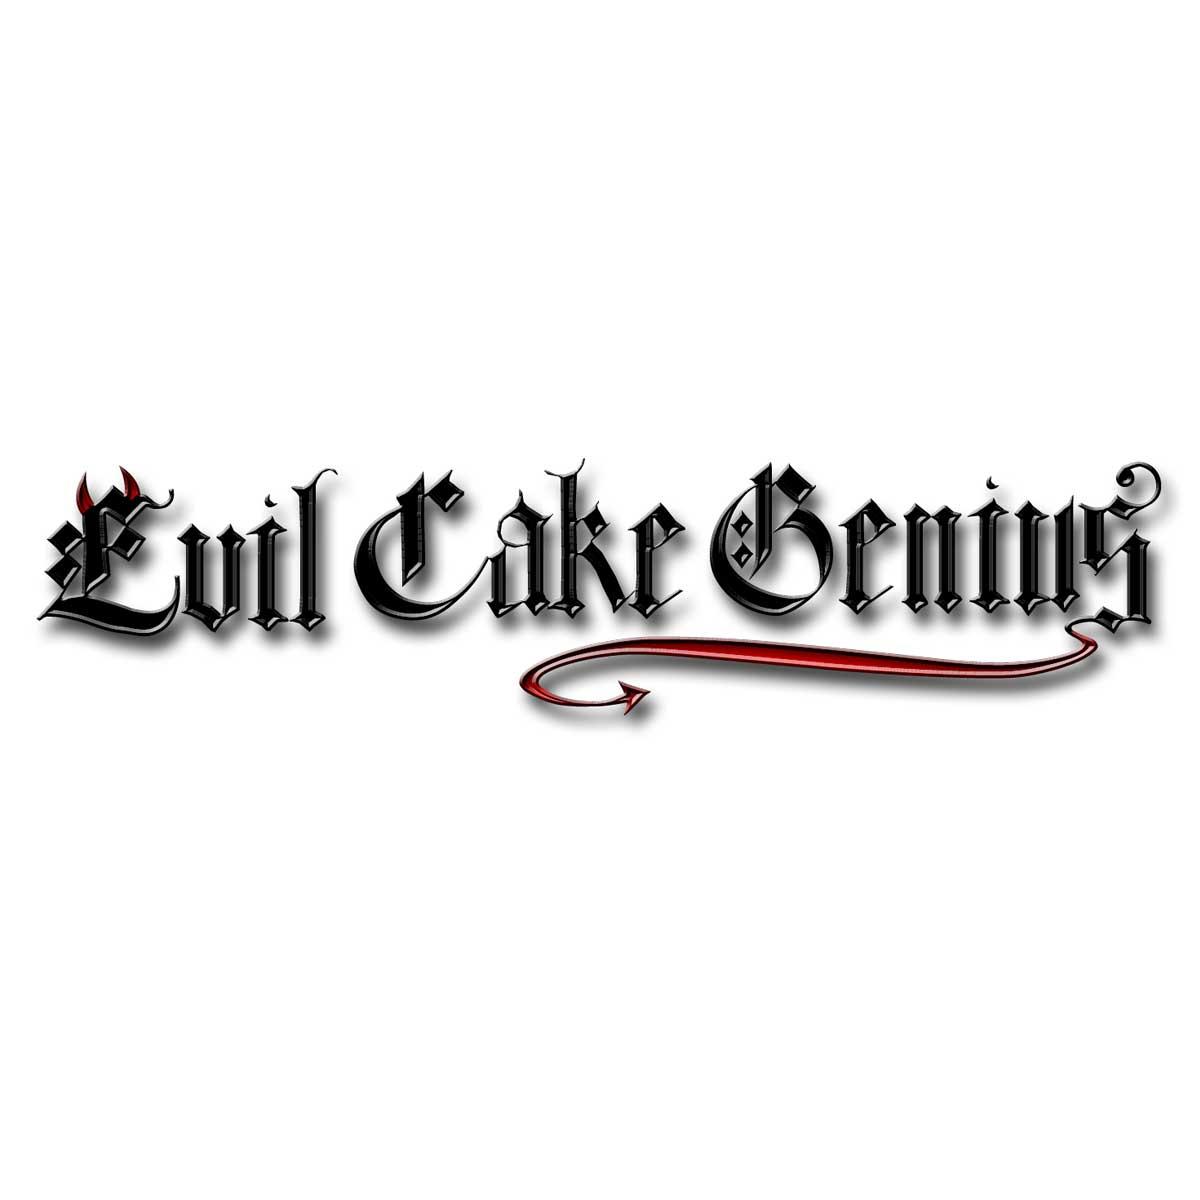 Black Gel Food Color Evil Cake Genius